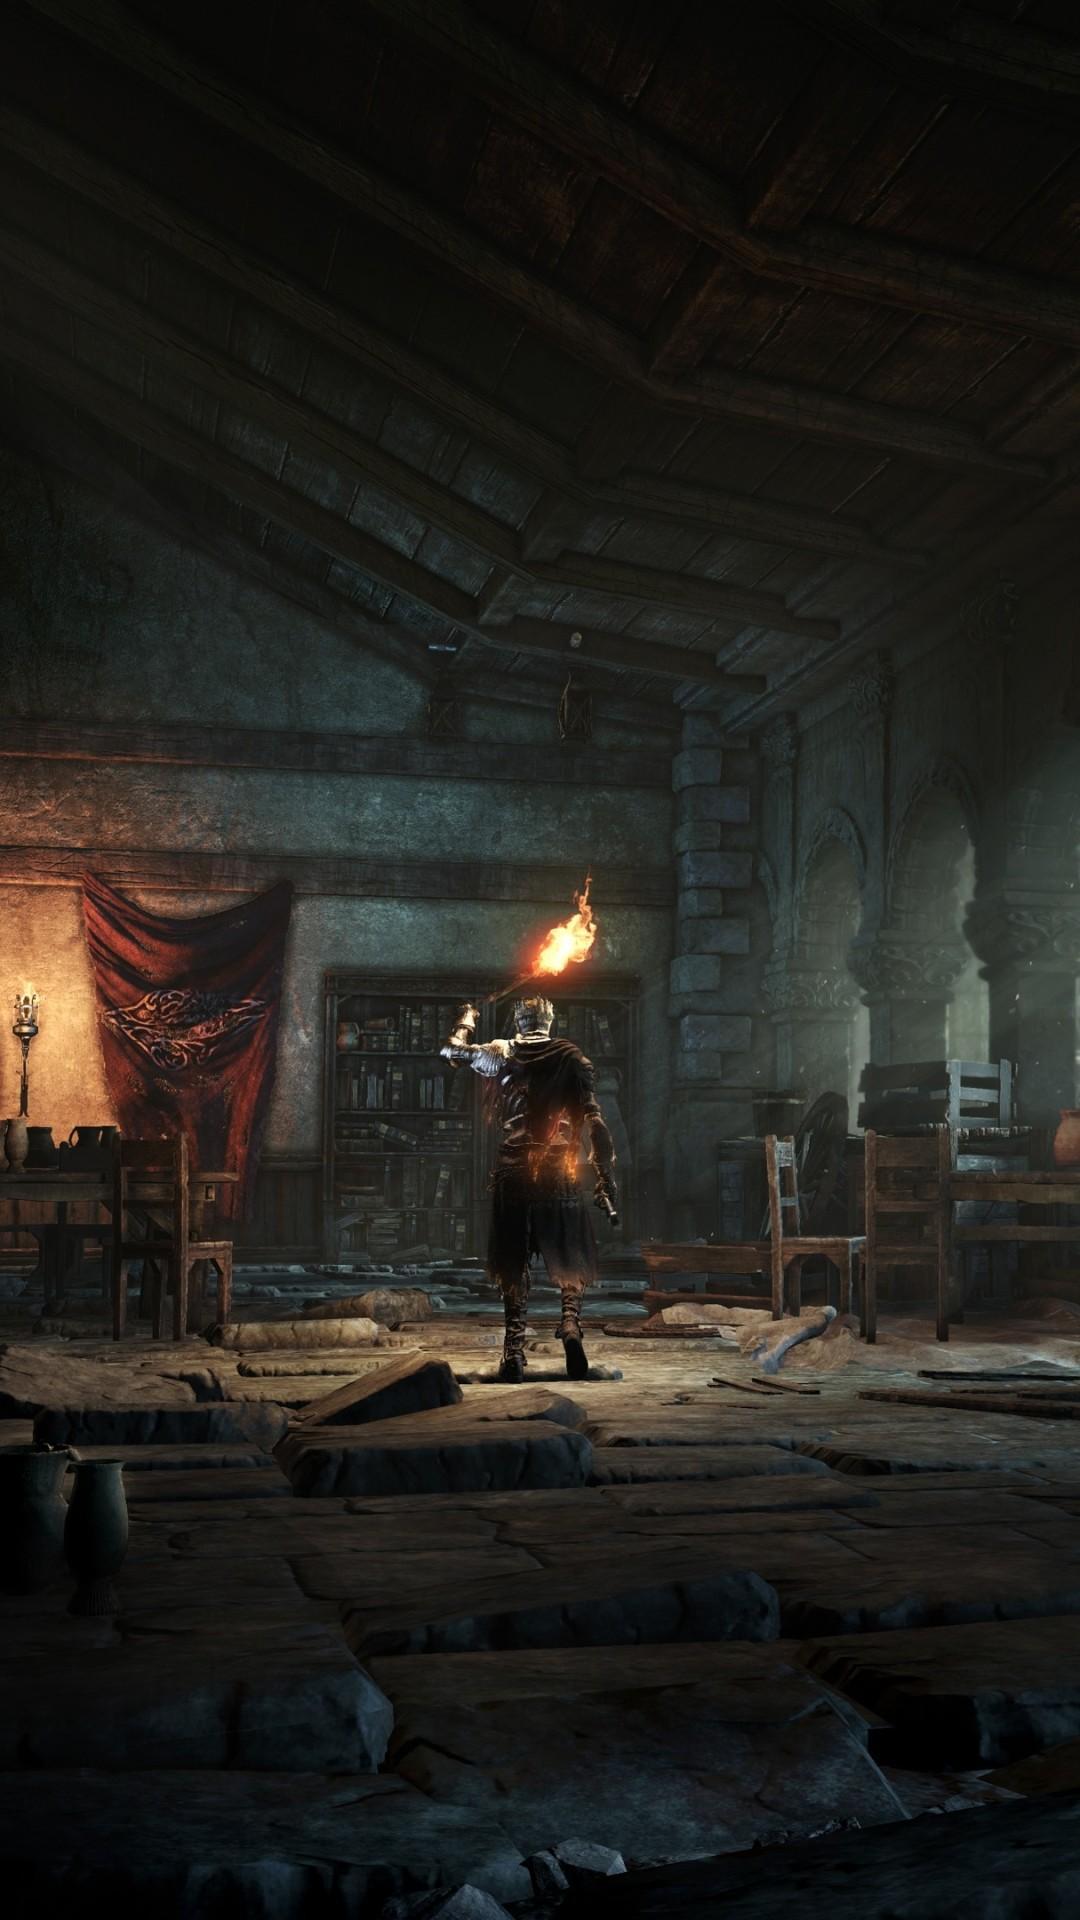 Download Dark Souls Pixel Wallpaper Hd Backgrounds Download Itl Cat